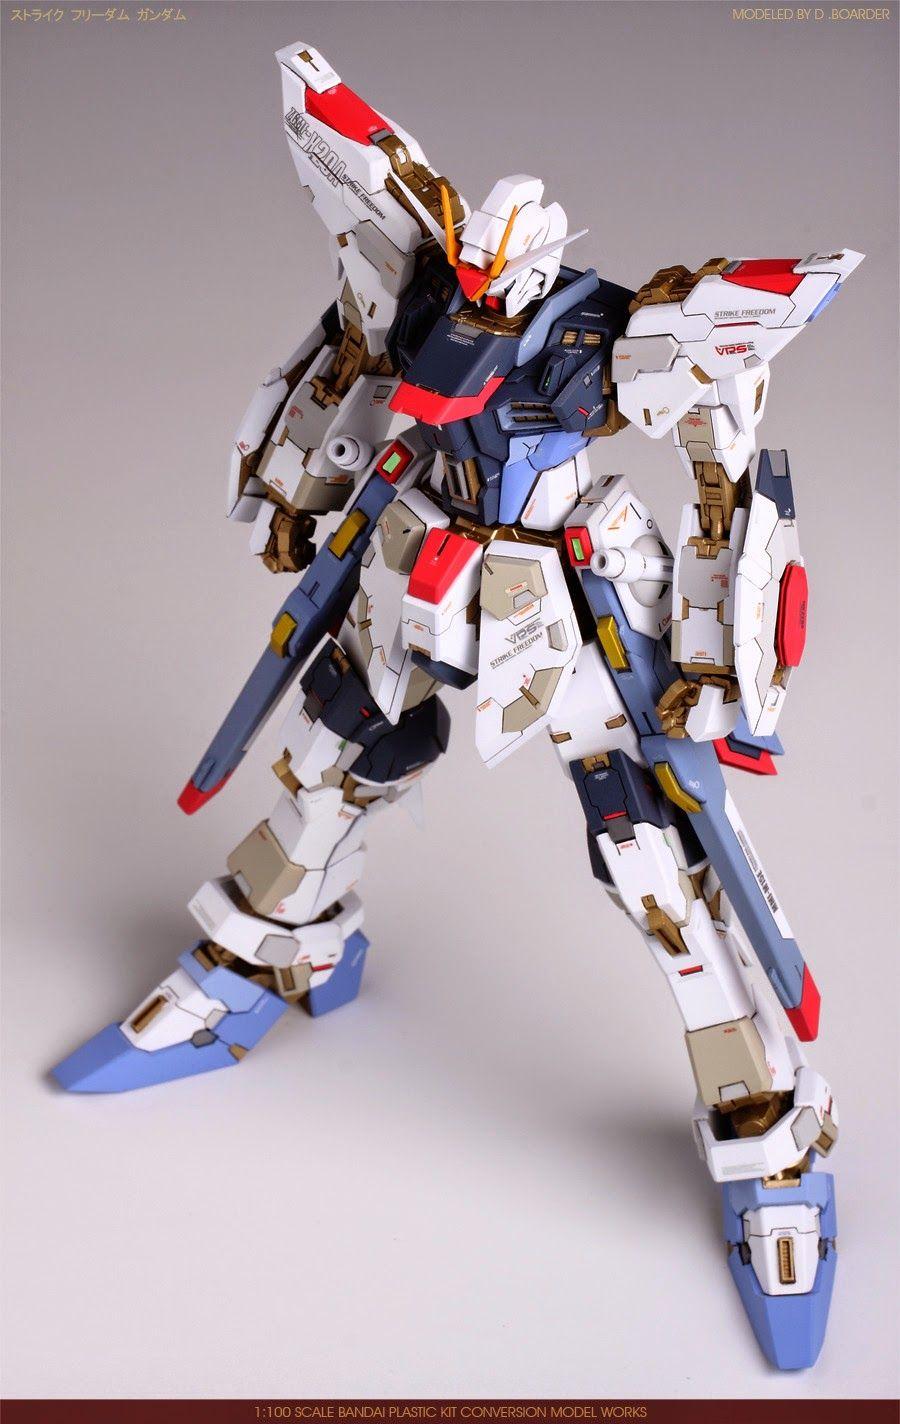 15+ Mg Strike Freedom Gundam Image Download 17